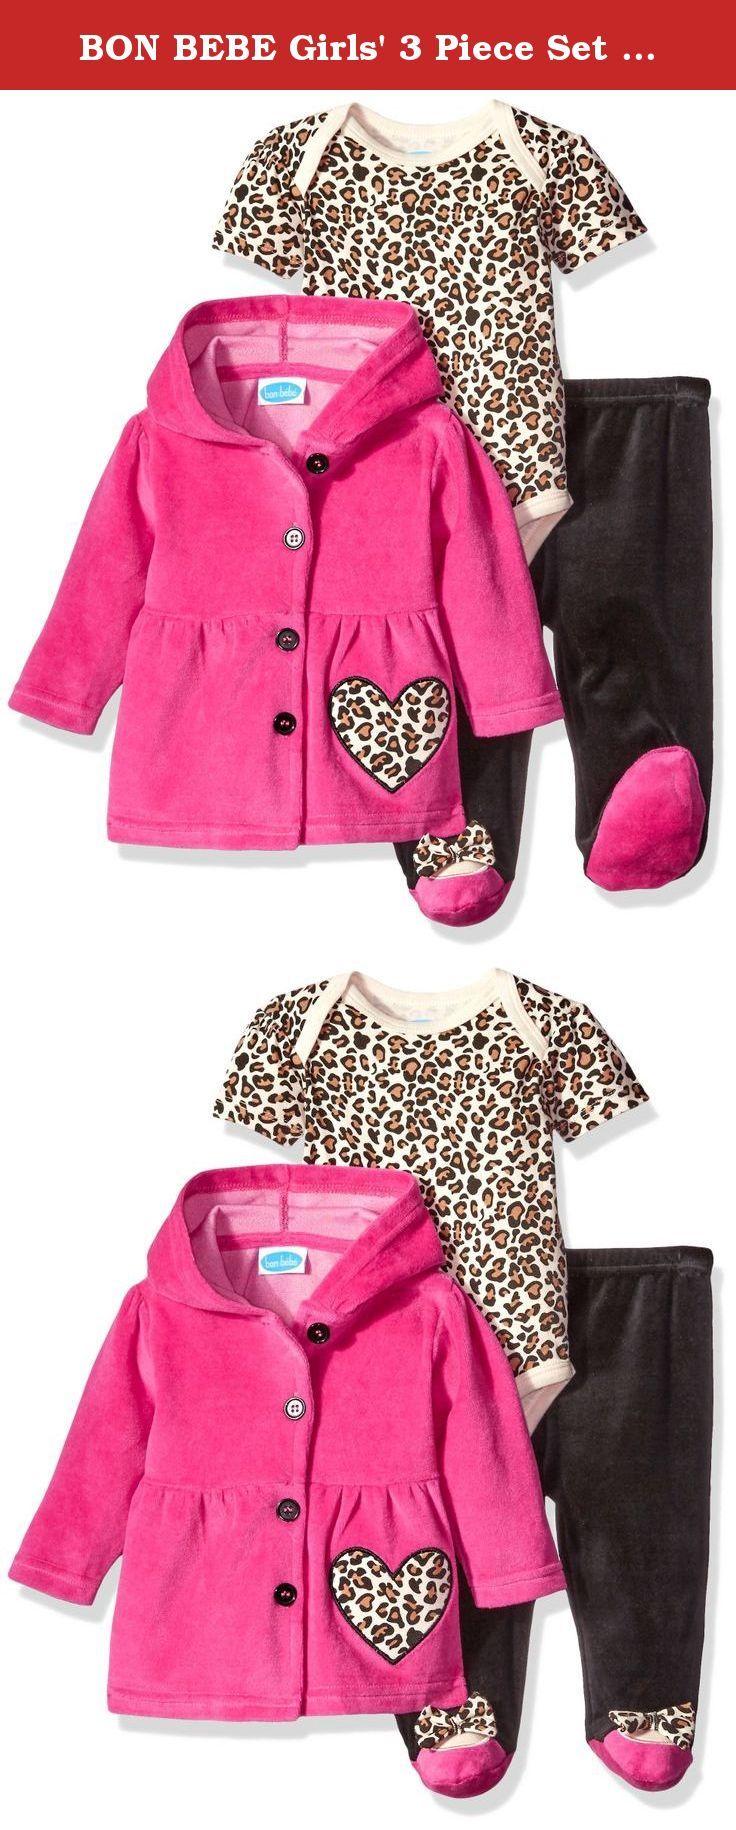 01bb53eb8c7 BON BEBE Girls' 3 Piece Set with Velour Jacket Pant and Bodysuit, Le… | Pant  Sets, Clothing Sets, Clothing, Baby Girls, Baby, Clothing, Shoes & Jewelry